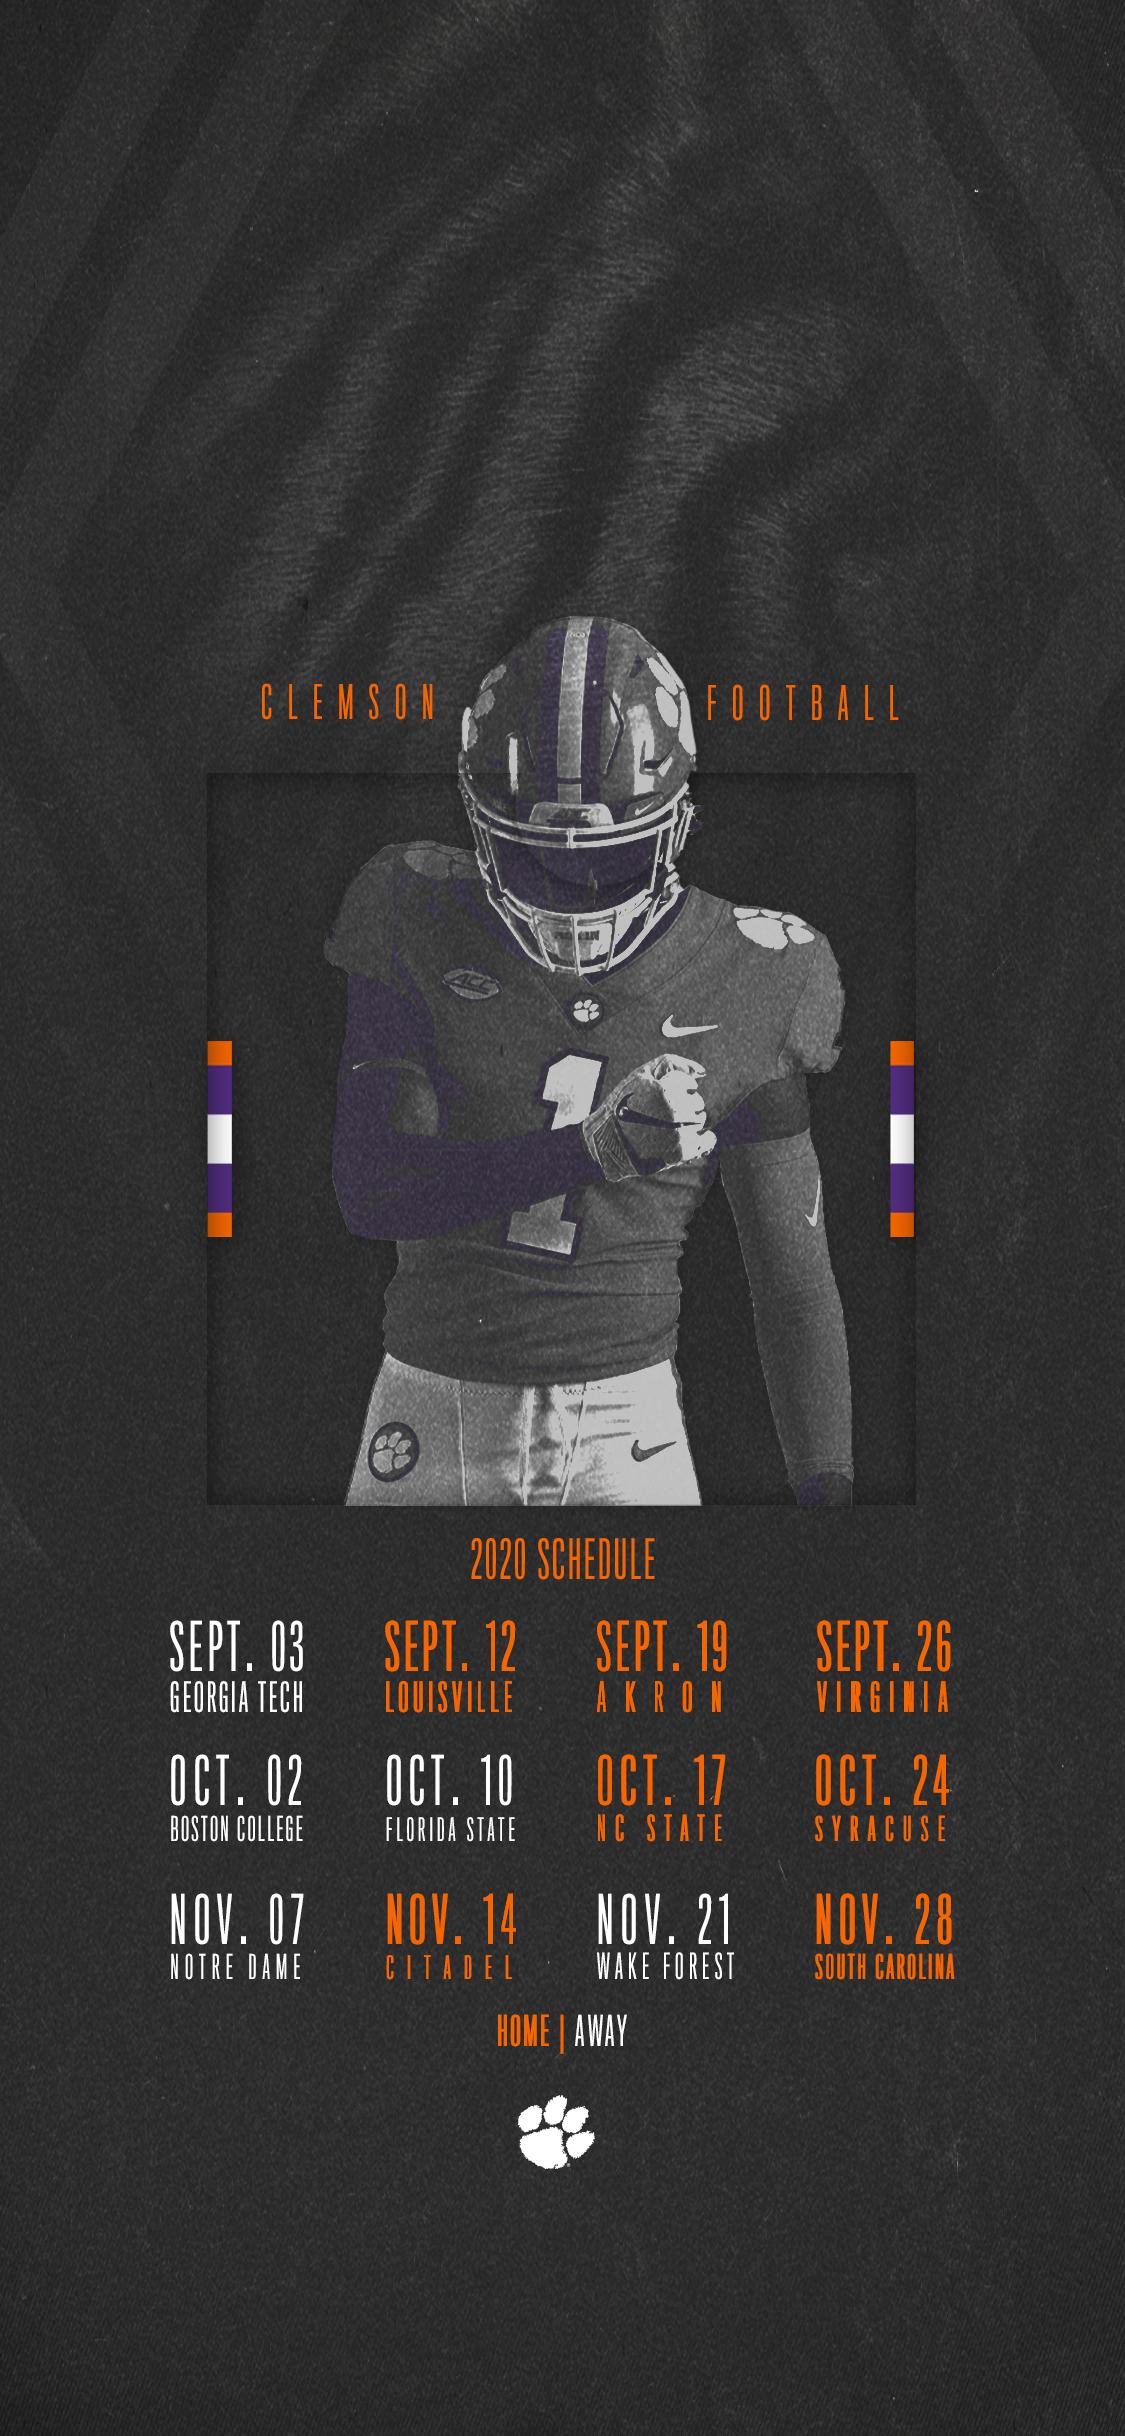 Clemson Announces 2020 Football Schedule – Clemson Tigers inside Printable Nfl 2021 Schedule